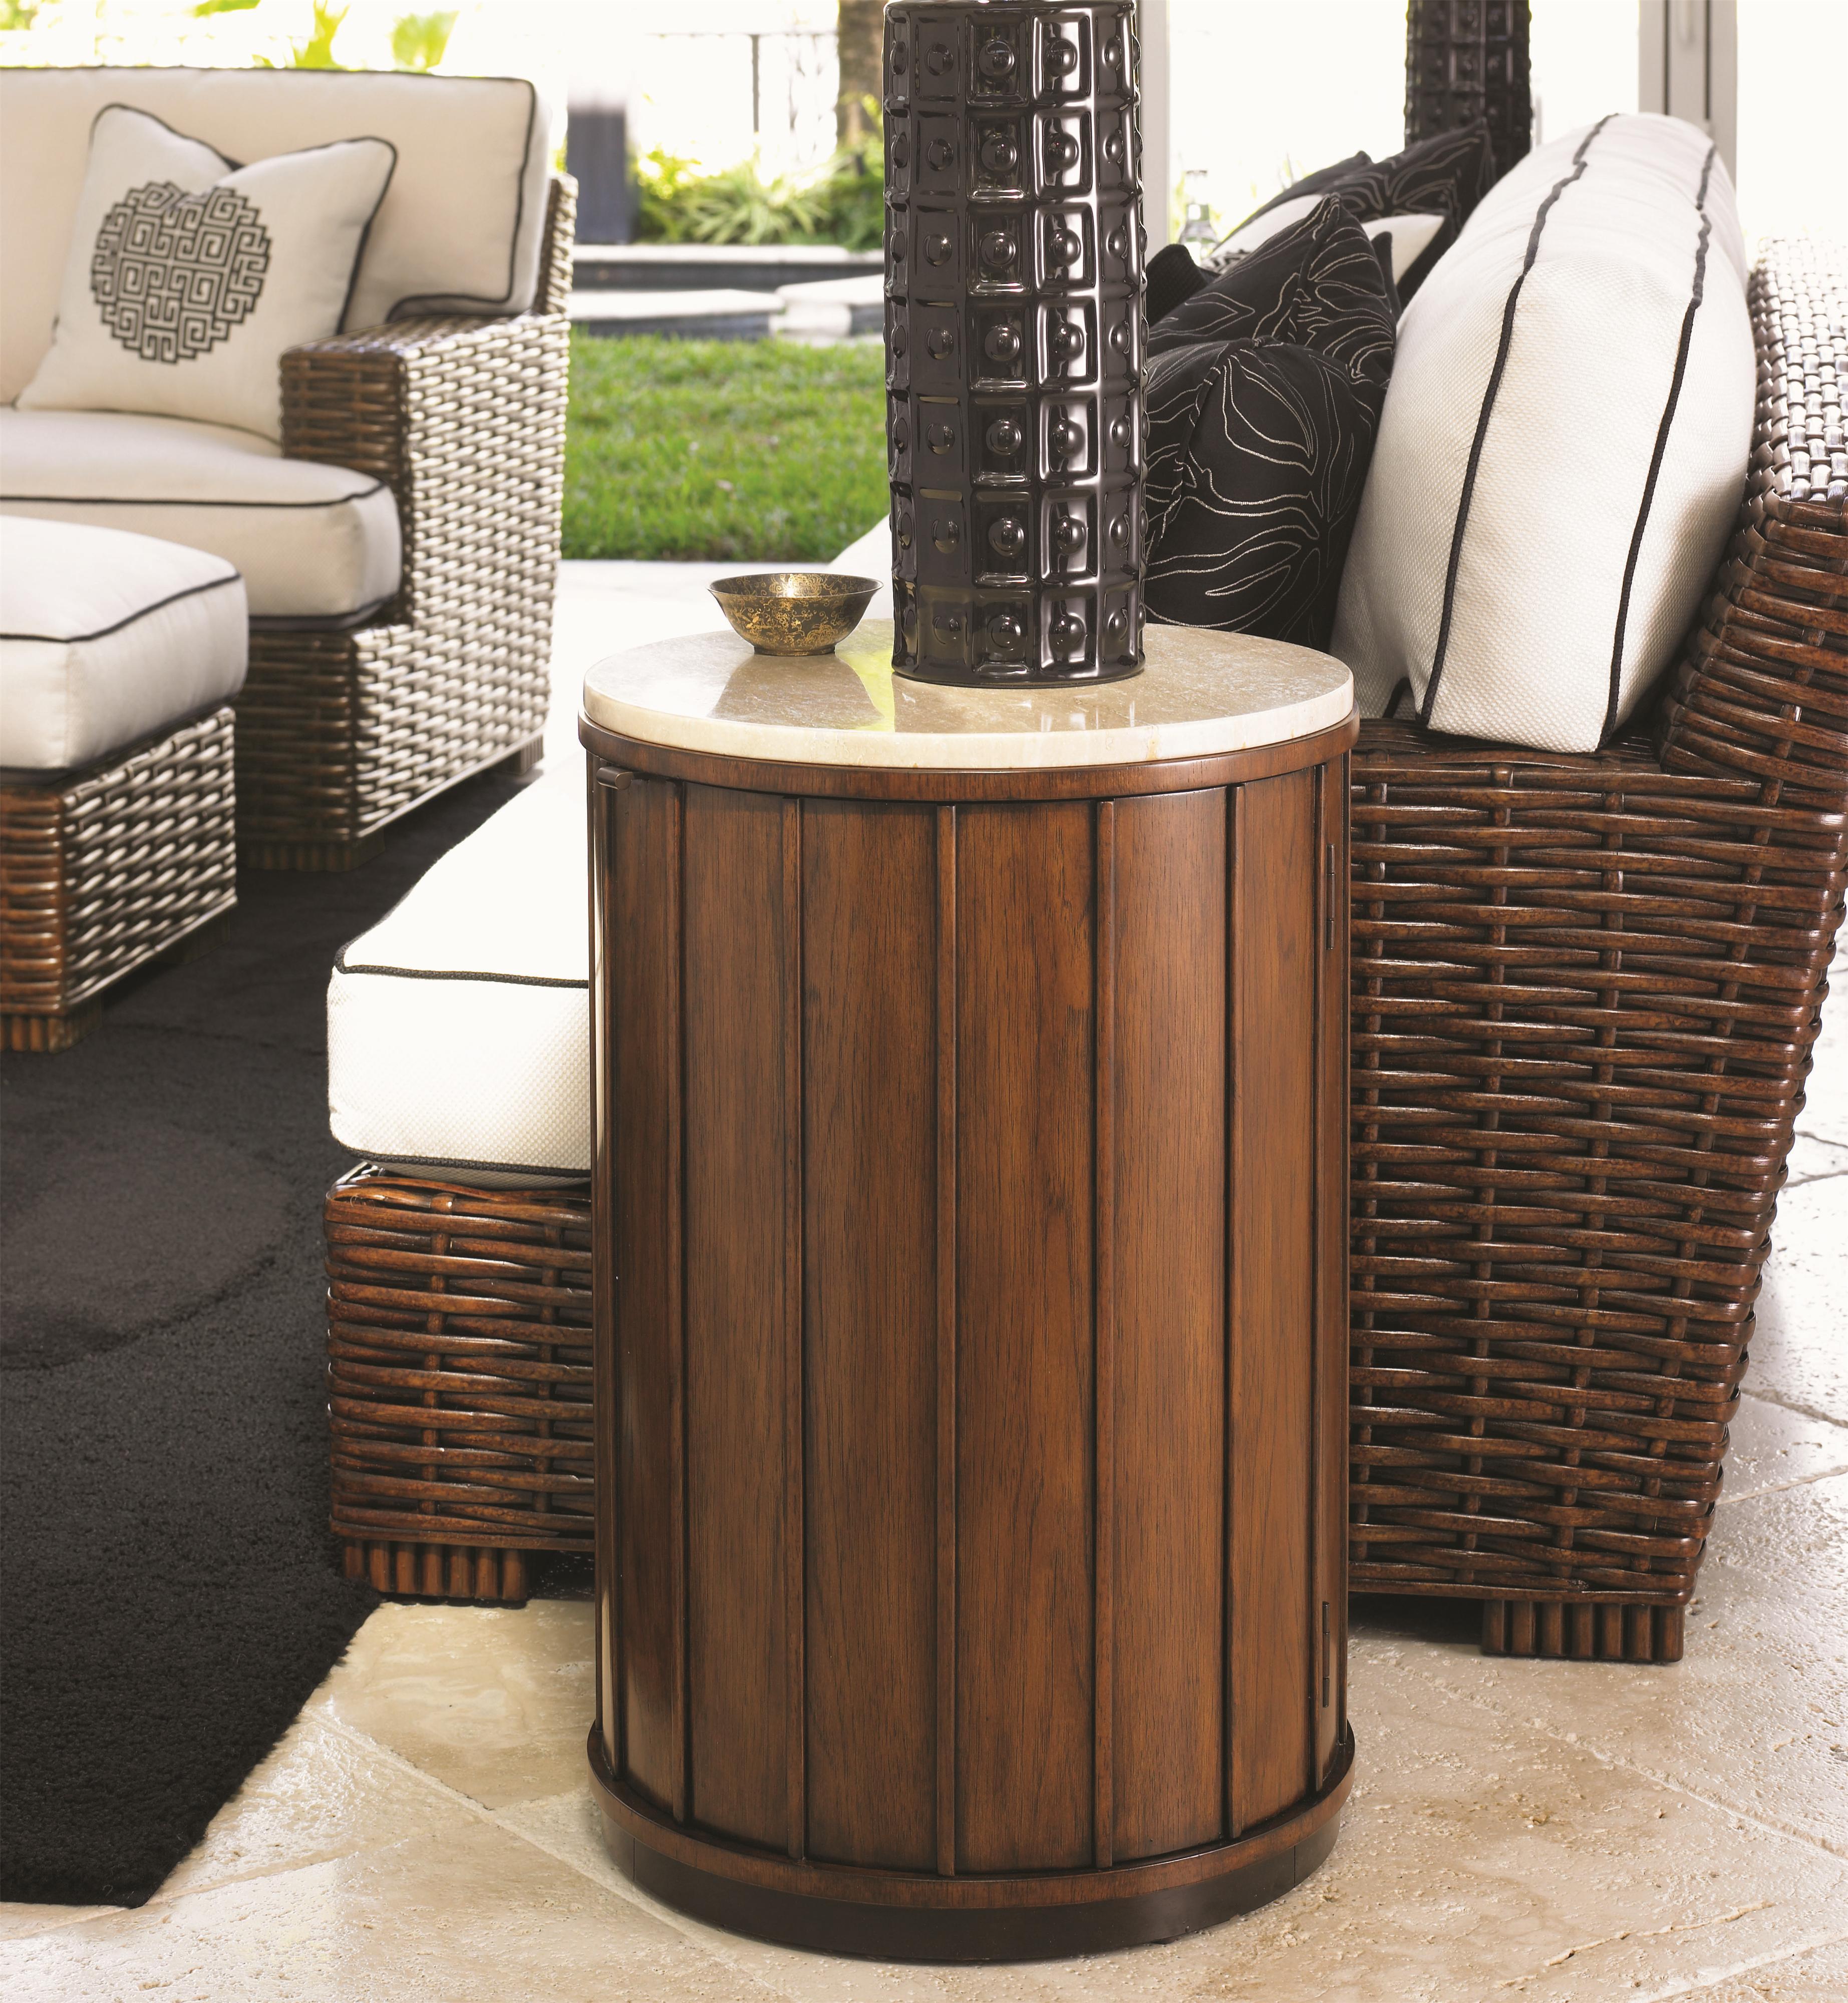 Tommy Bahama Home Ocean Club Fiji Drum Table - Item Number: 536-950C